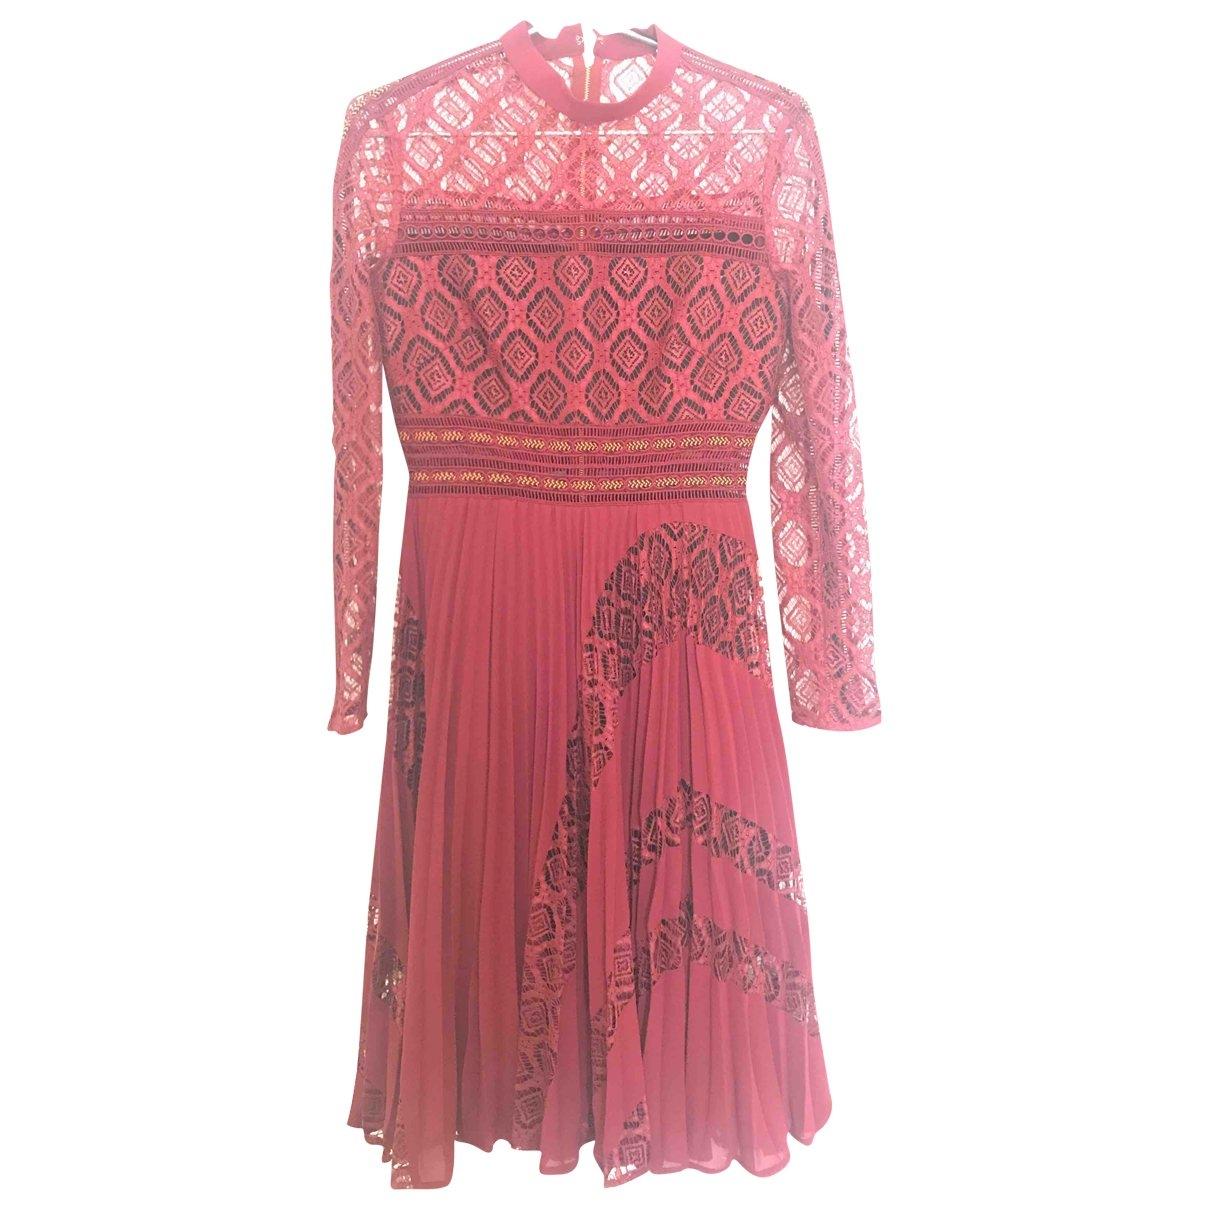 Self Portrait \N Burgundy dress for Women 8 UK